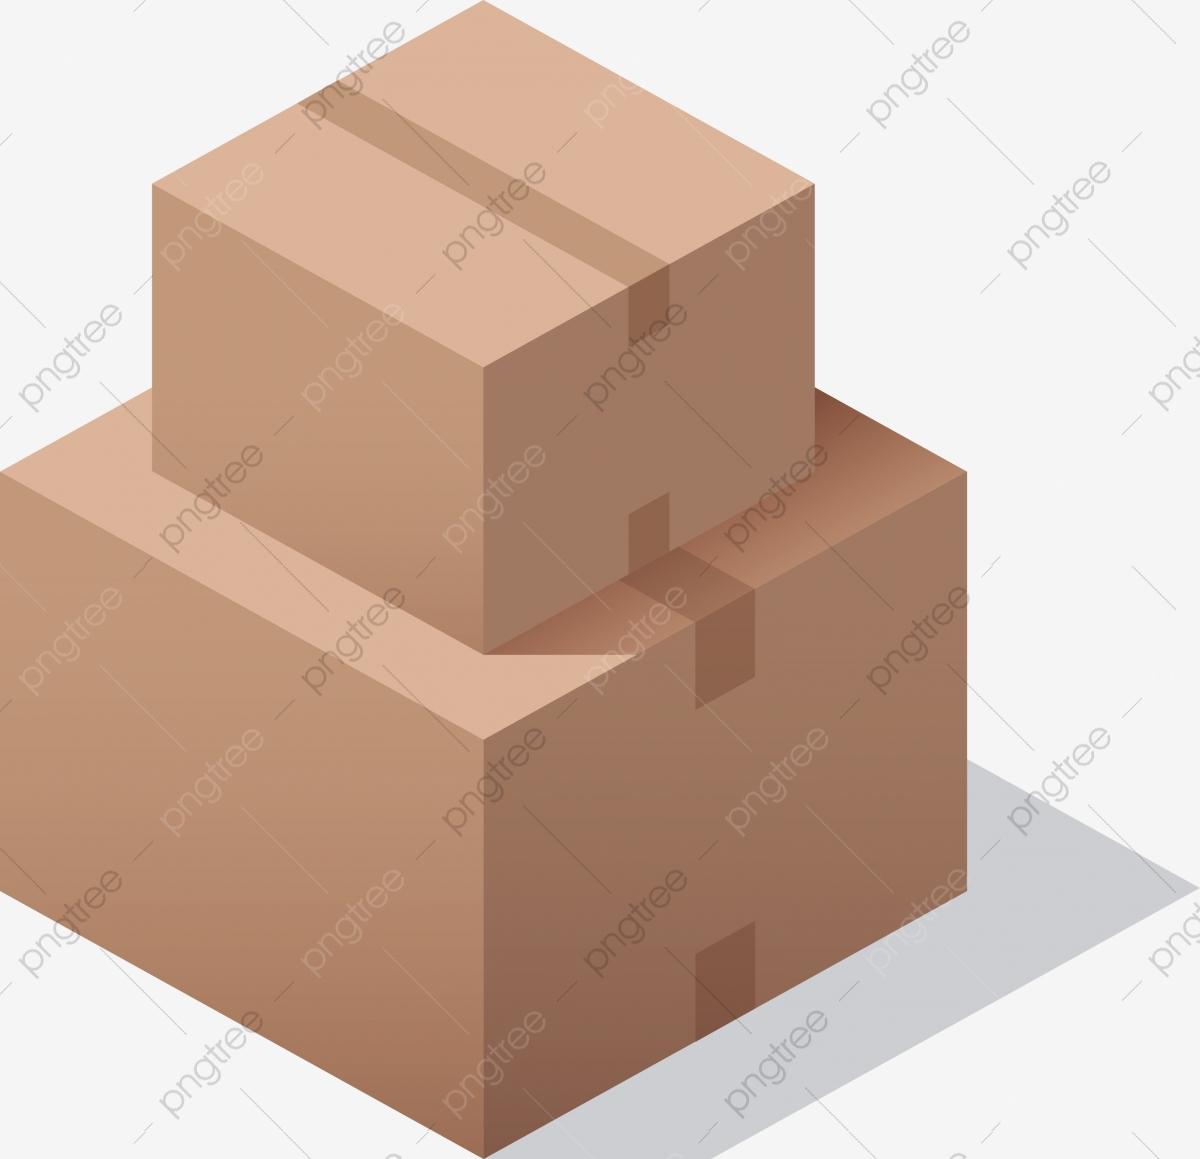 Two Cartons, Vector Png, Carton, Carton Box PNG and Vector with.